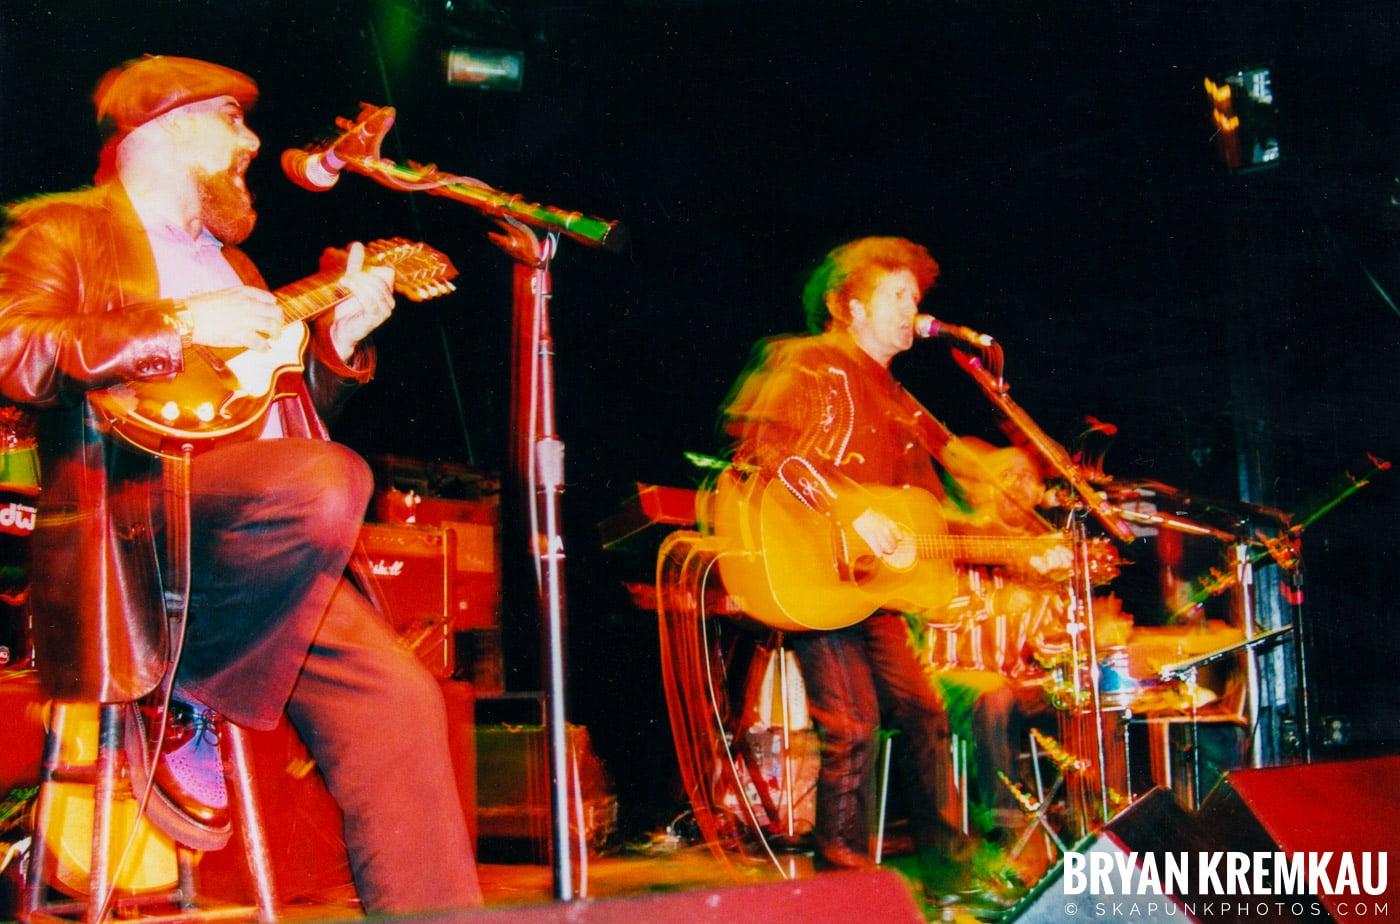 Willie Nile @ Irving Plaza, NYC - 10.4.04 (7)